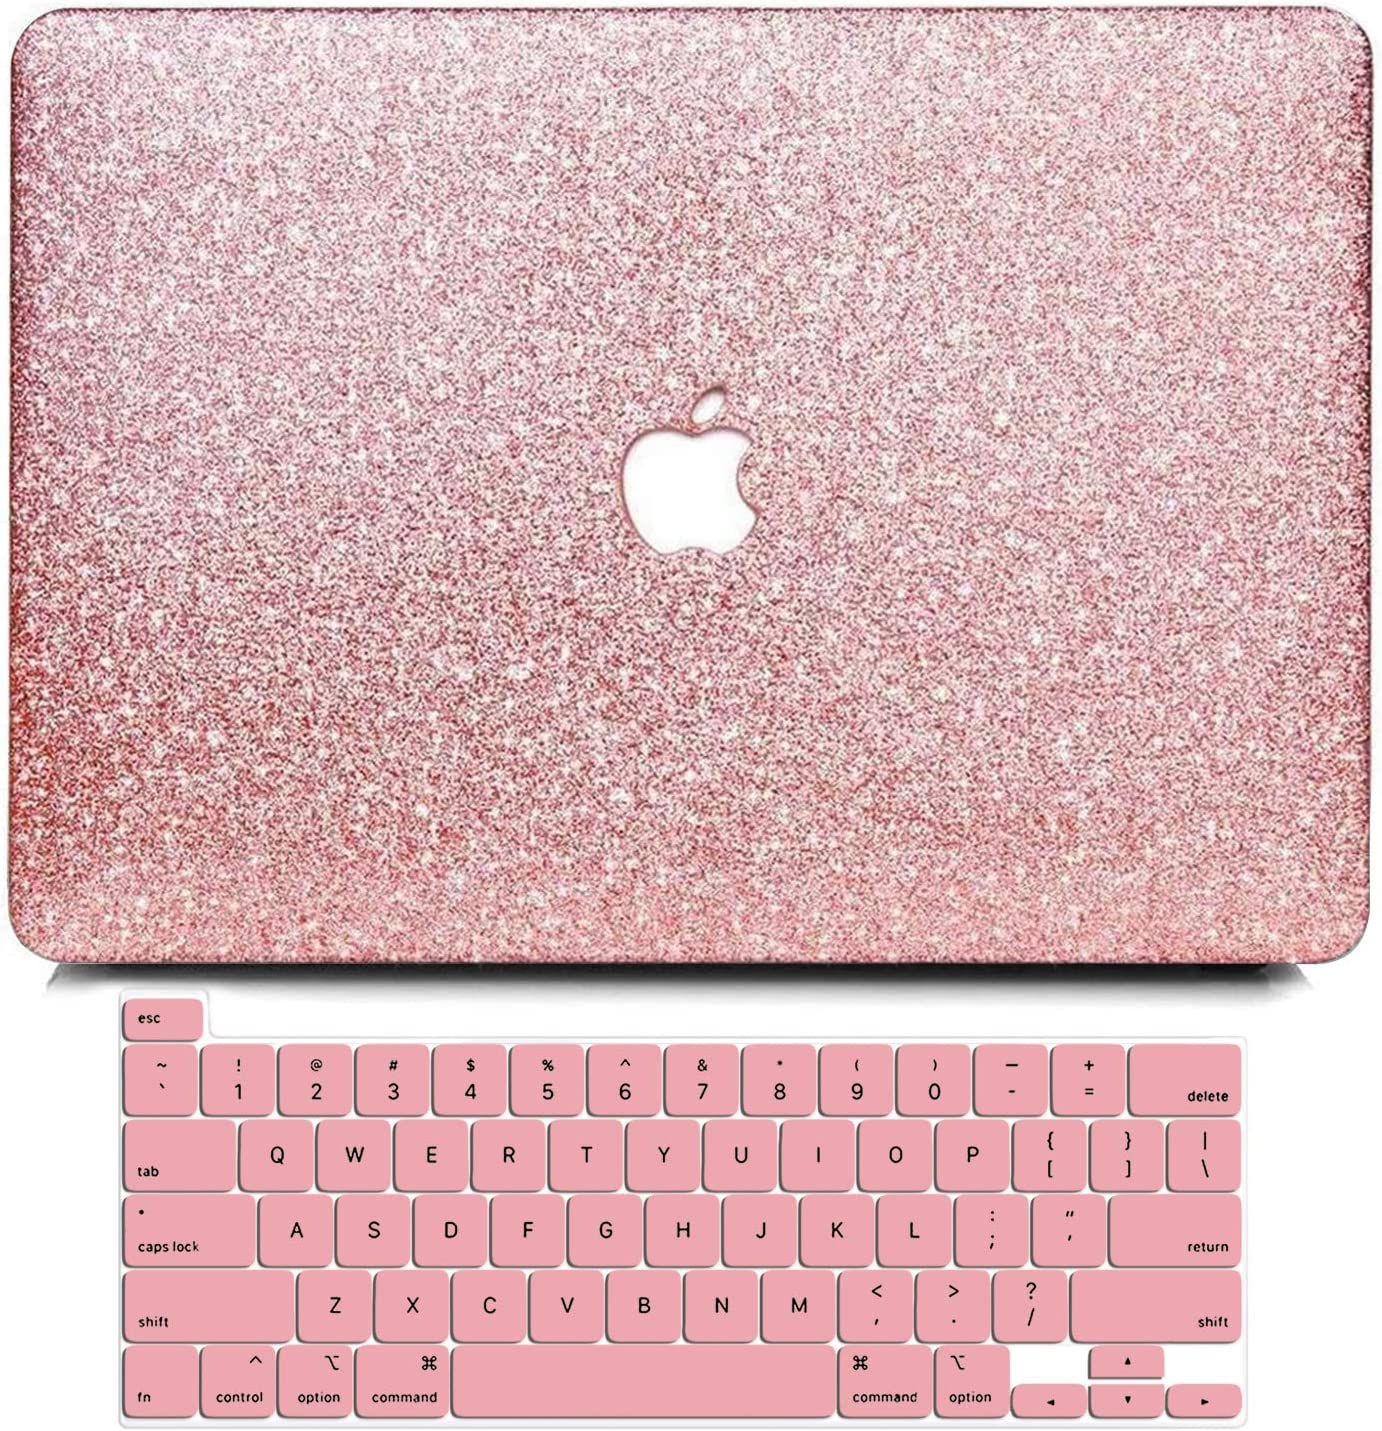 Apple MacBook Pro 16 in//pouce emballage neuf dans sa boîte leerkarton a2141